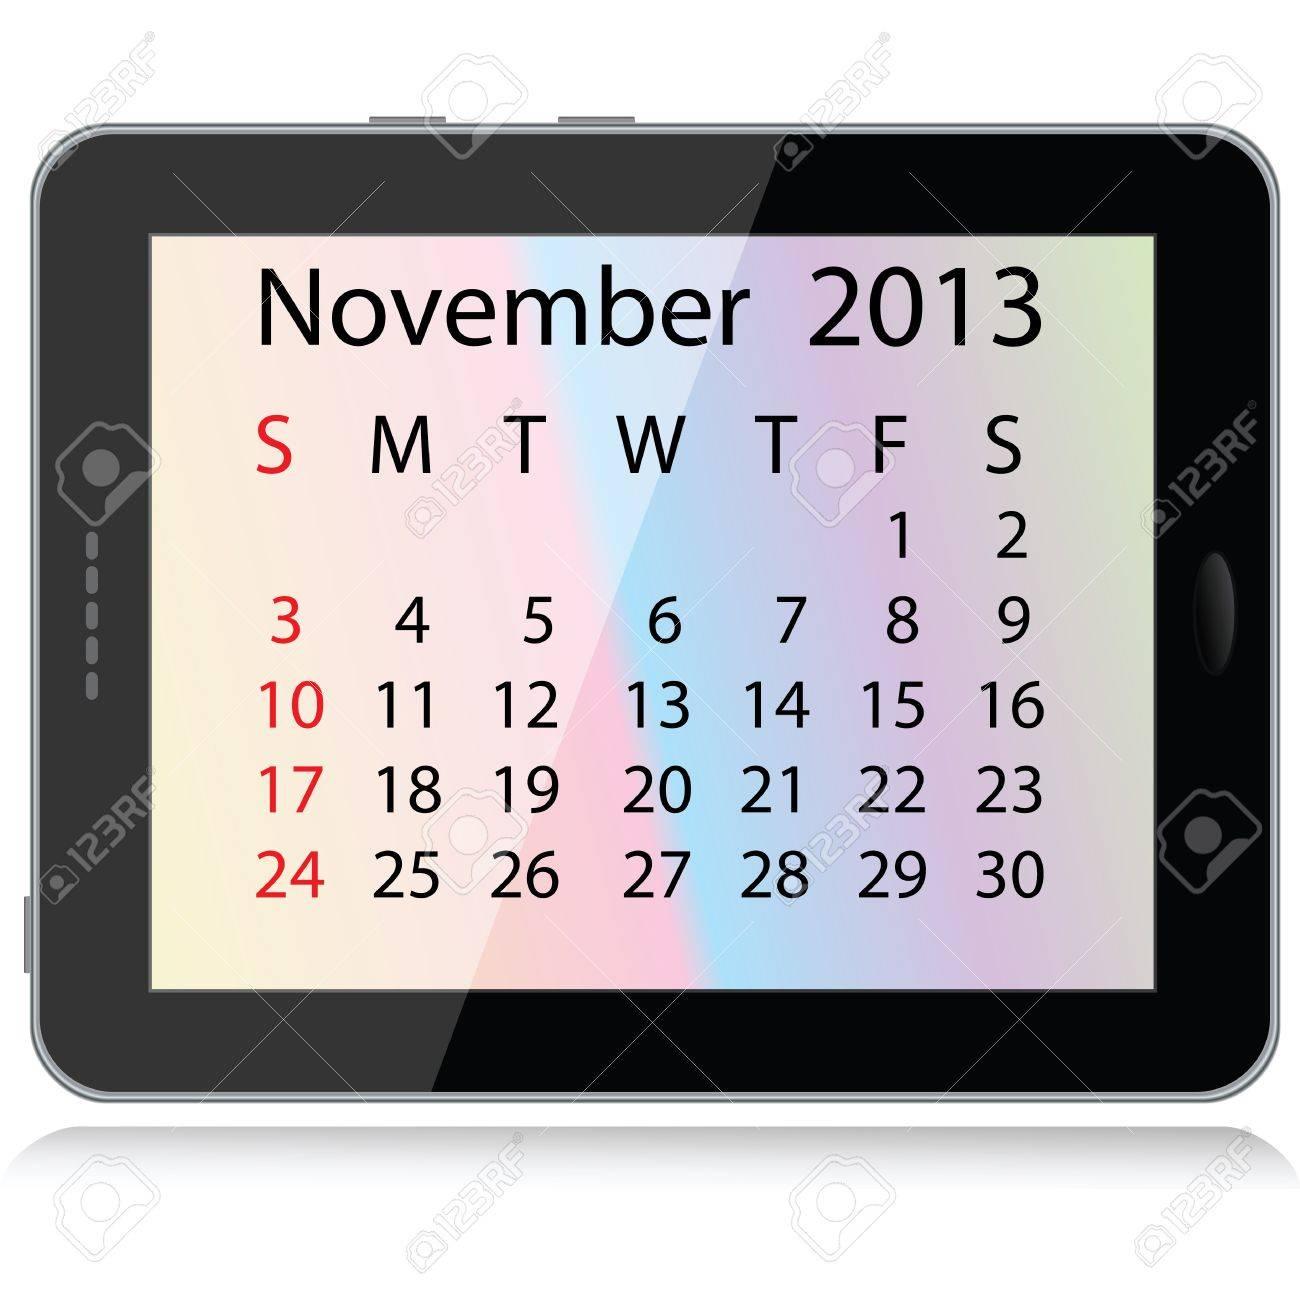 Illustration Of November 2013 Calendar Framed In A Tablet Pc ...